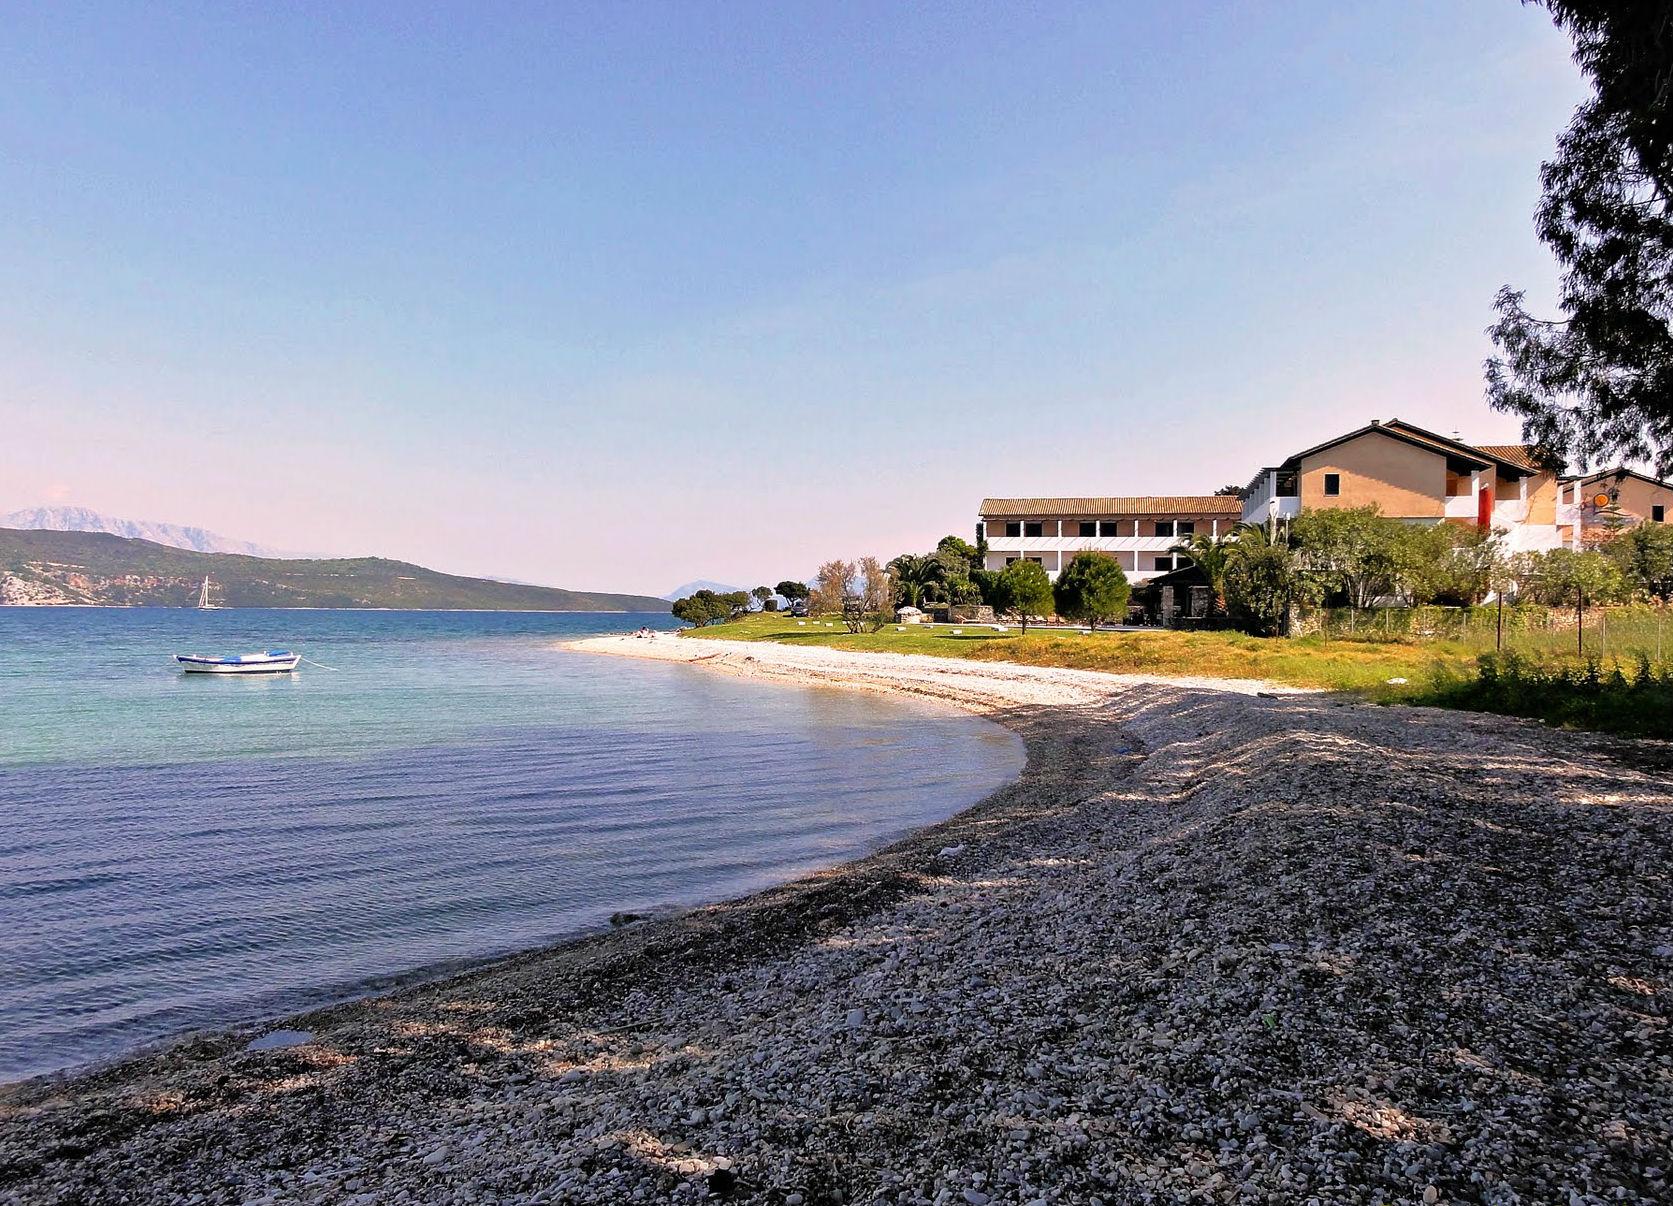 lefkada-beaches-ligia-beach-hotel